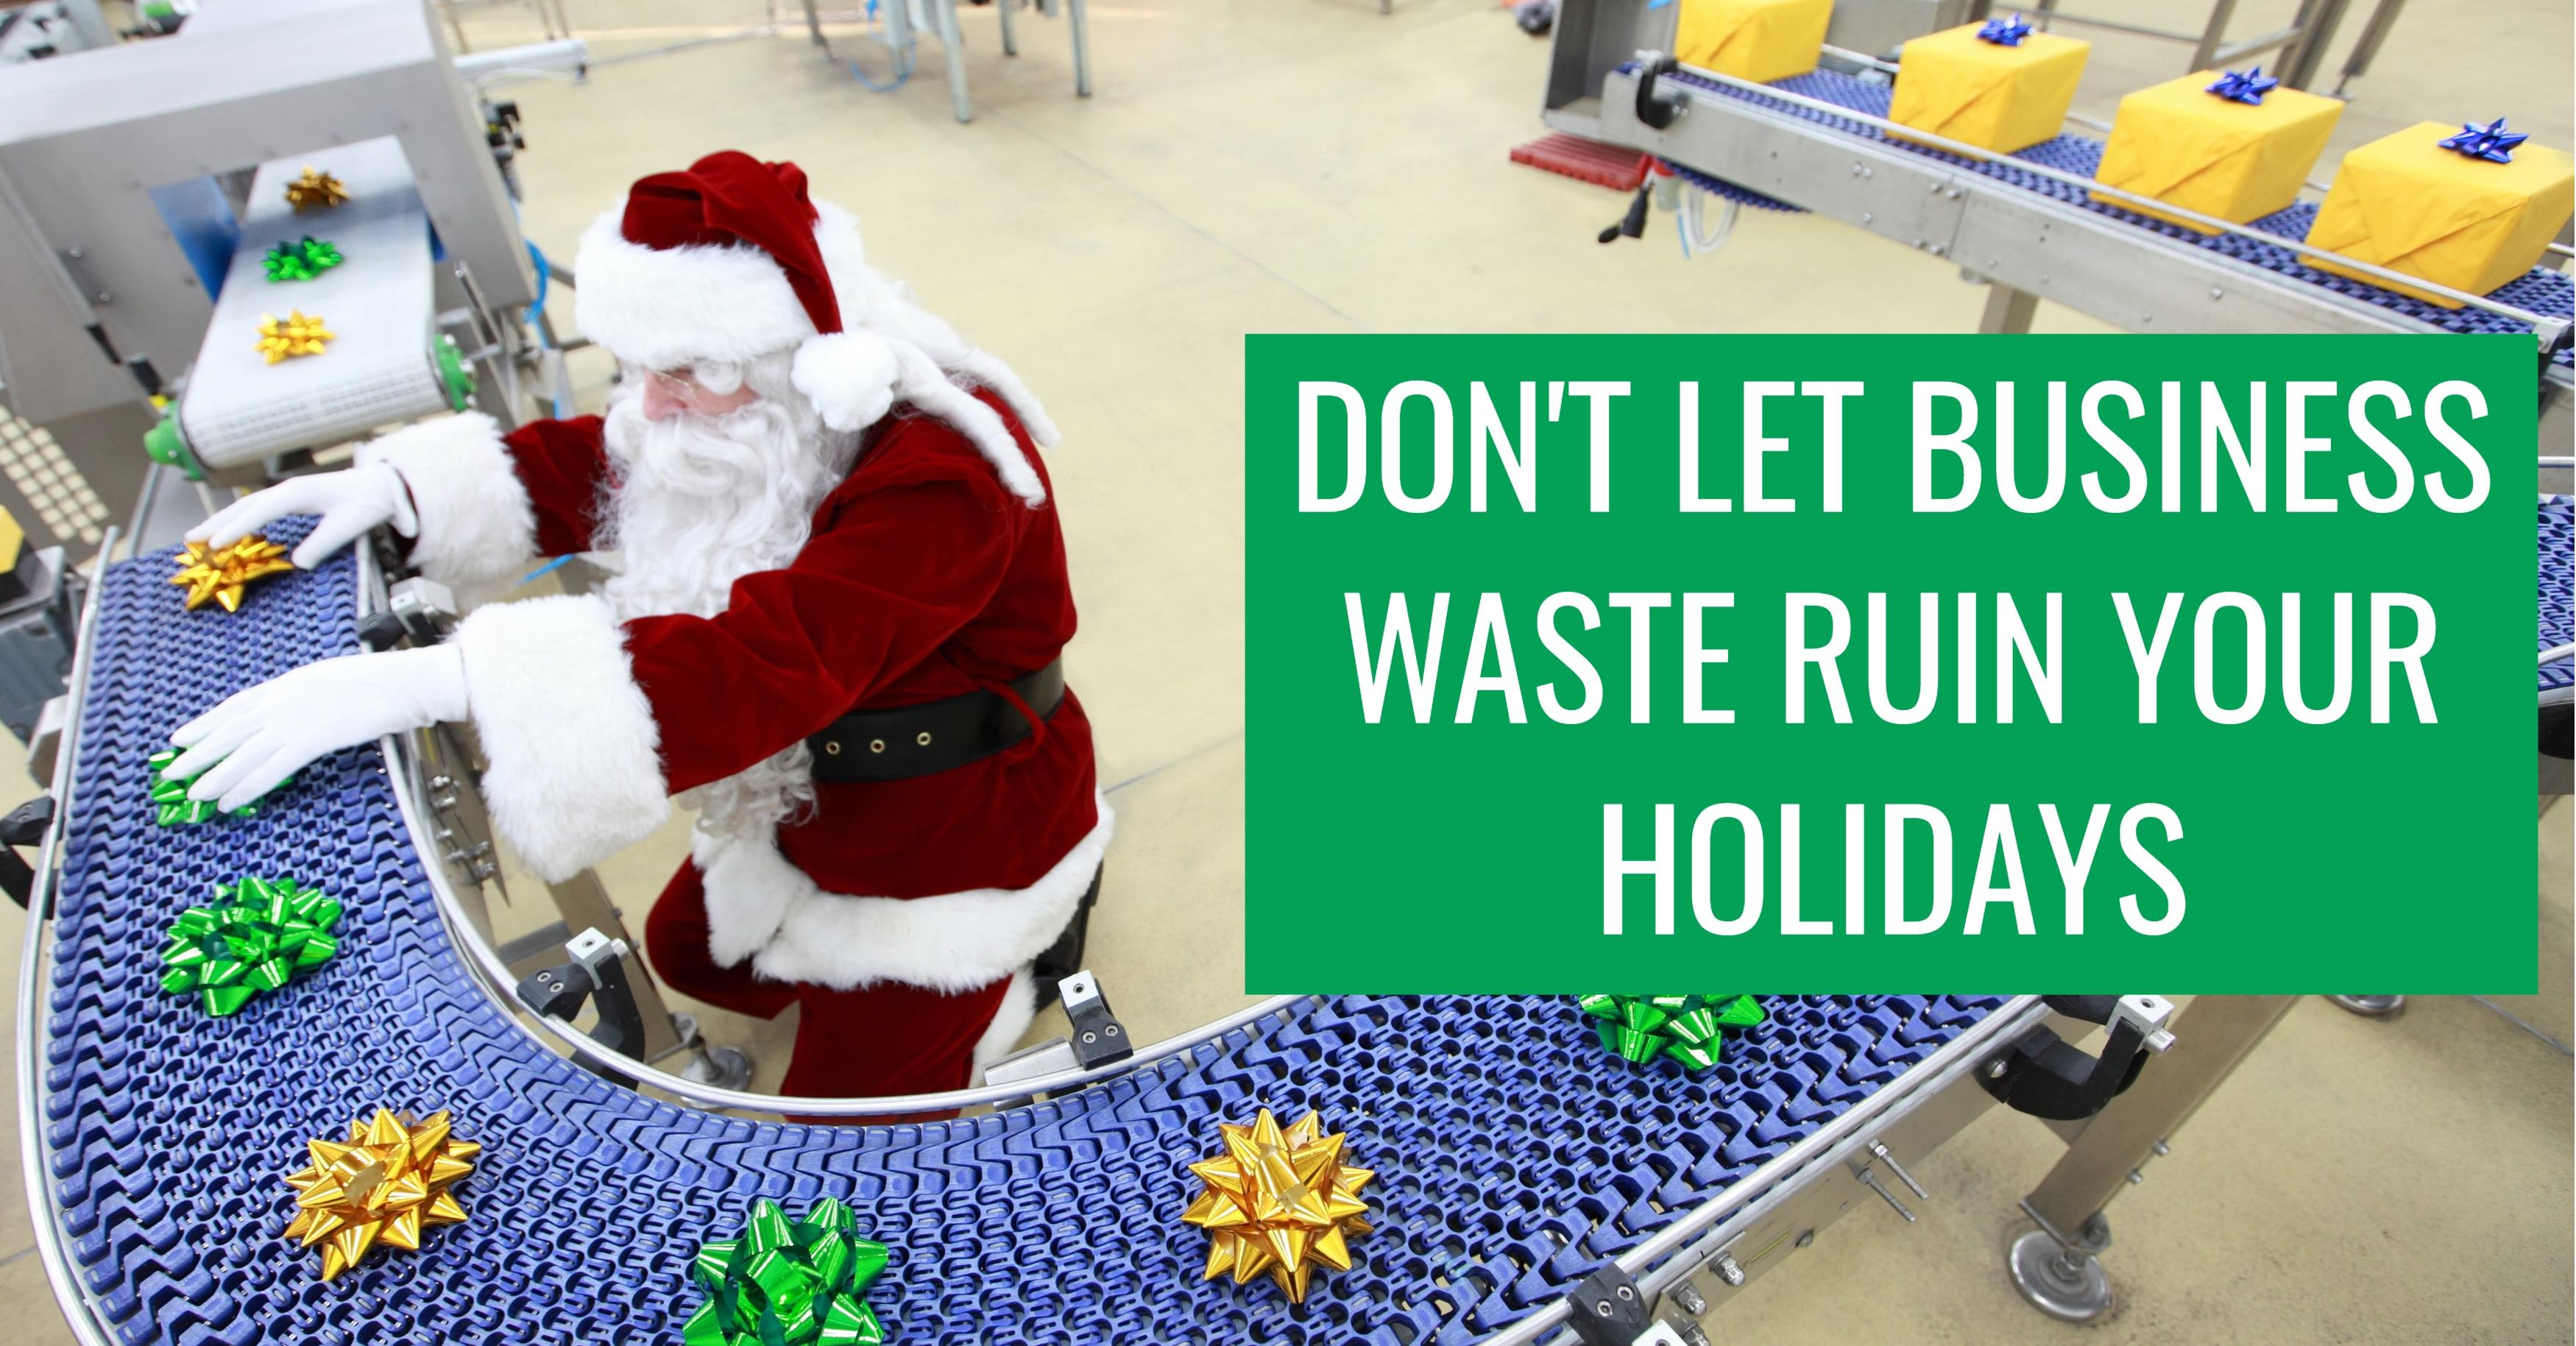 Business Waste Holidays